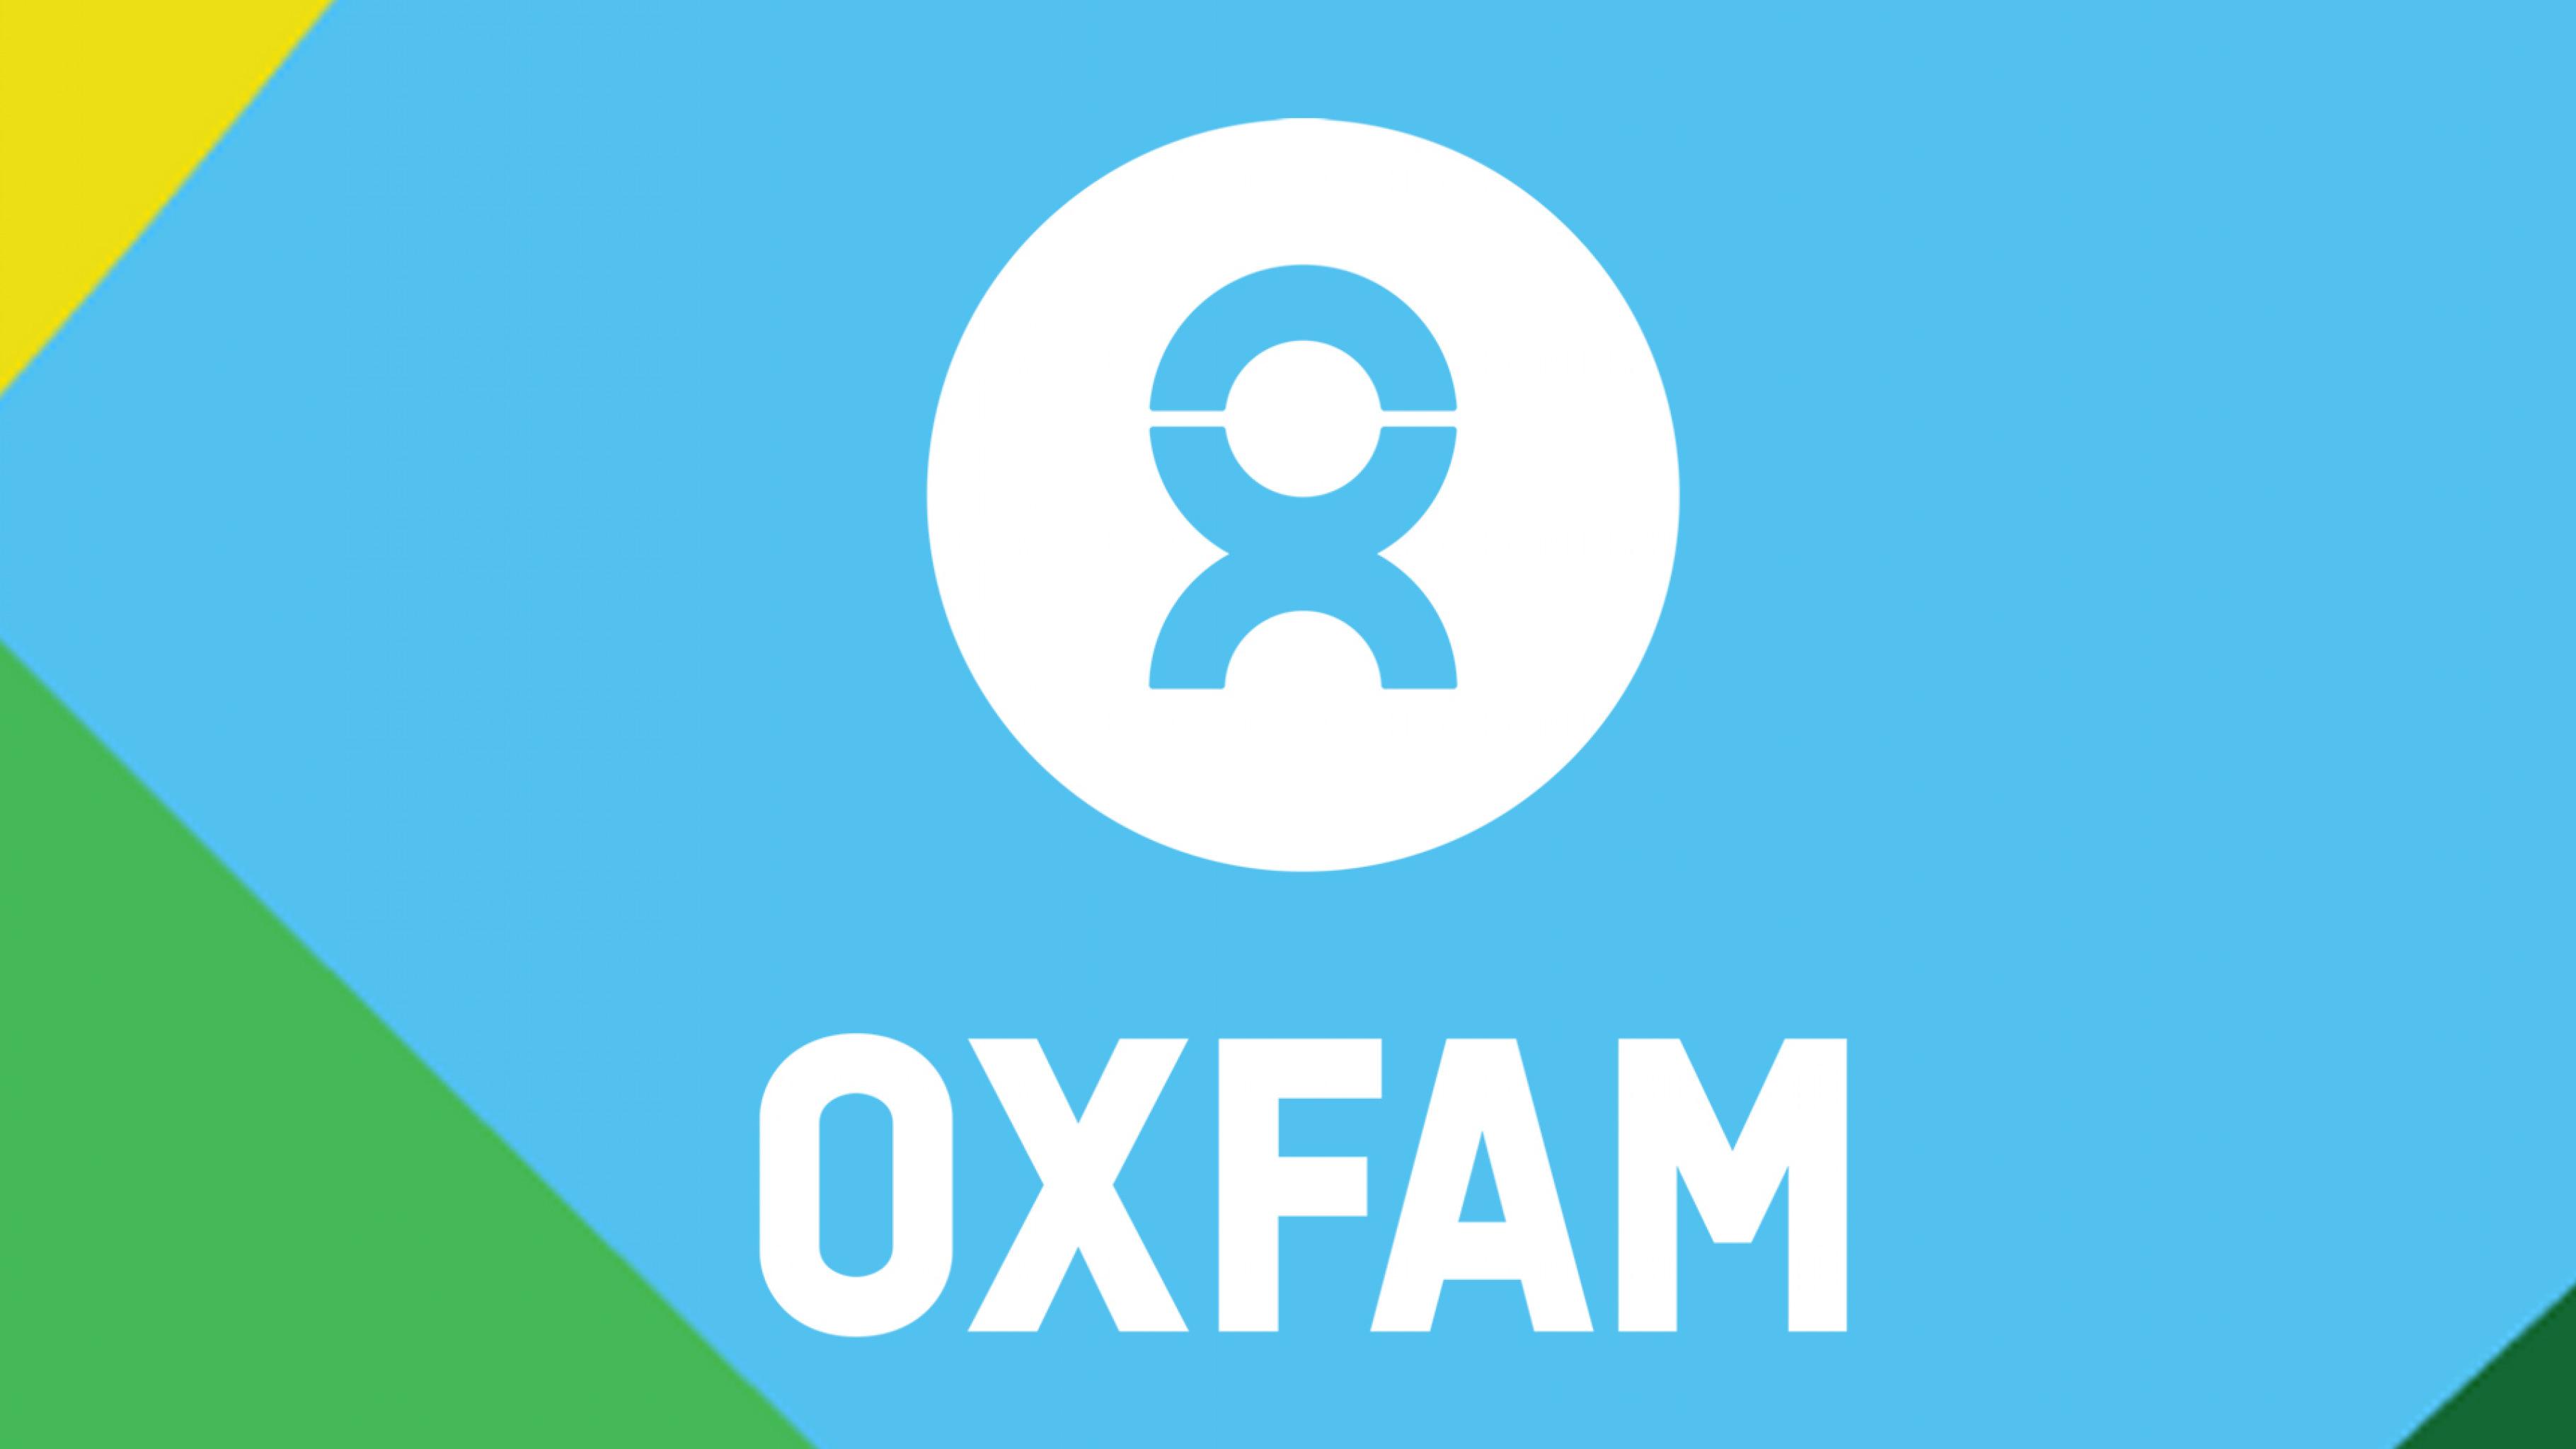 Platzhalter-Logo Oxfam